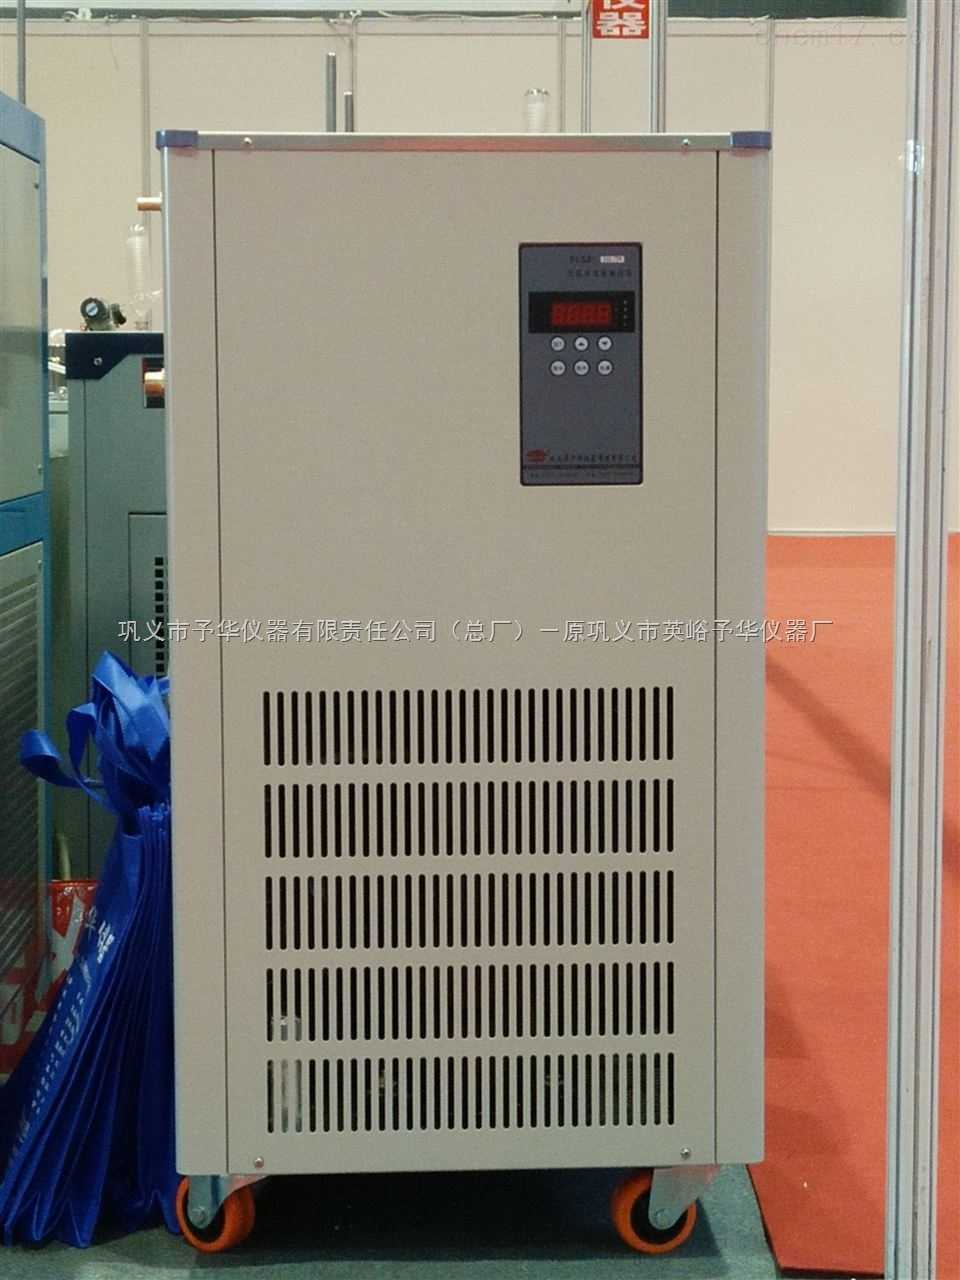 DLSB-30L系列低温冷却液循环泵使用说明—巩义予华